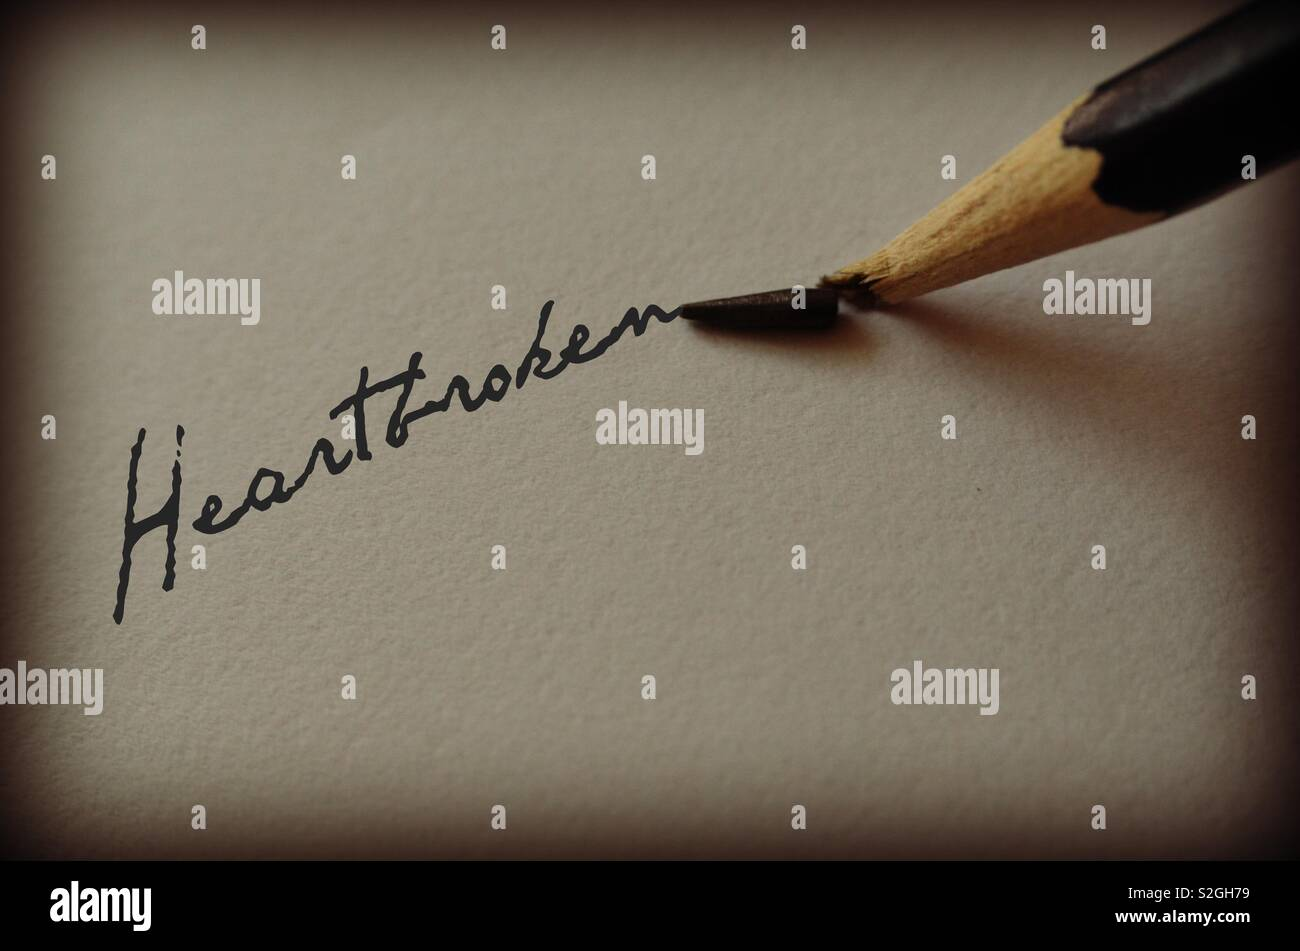 Heartbroken - Stock Image